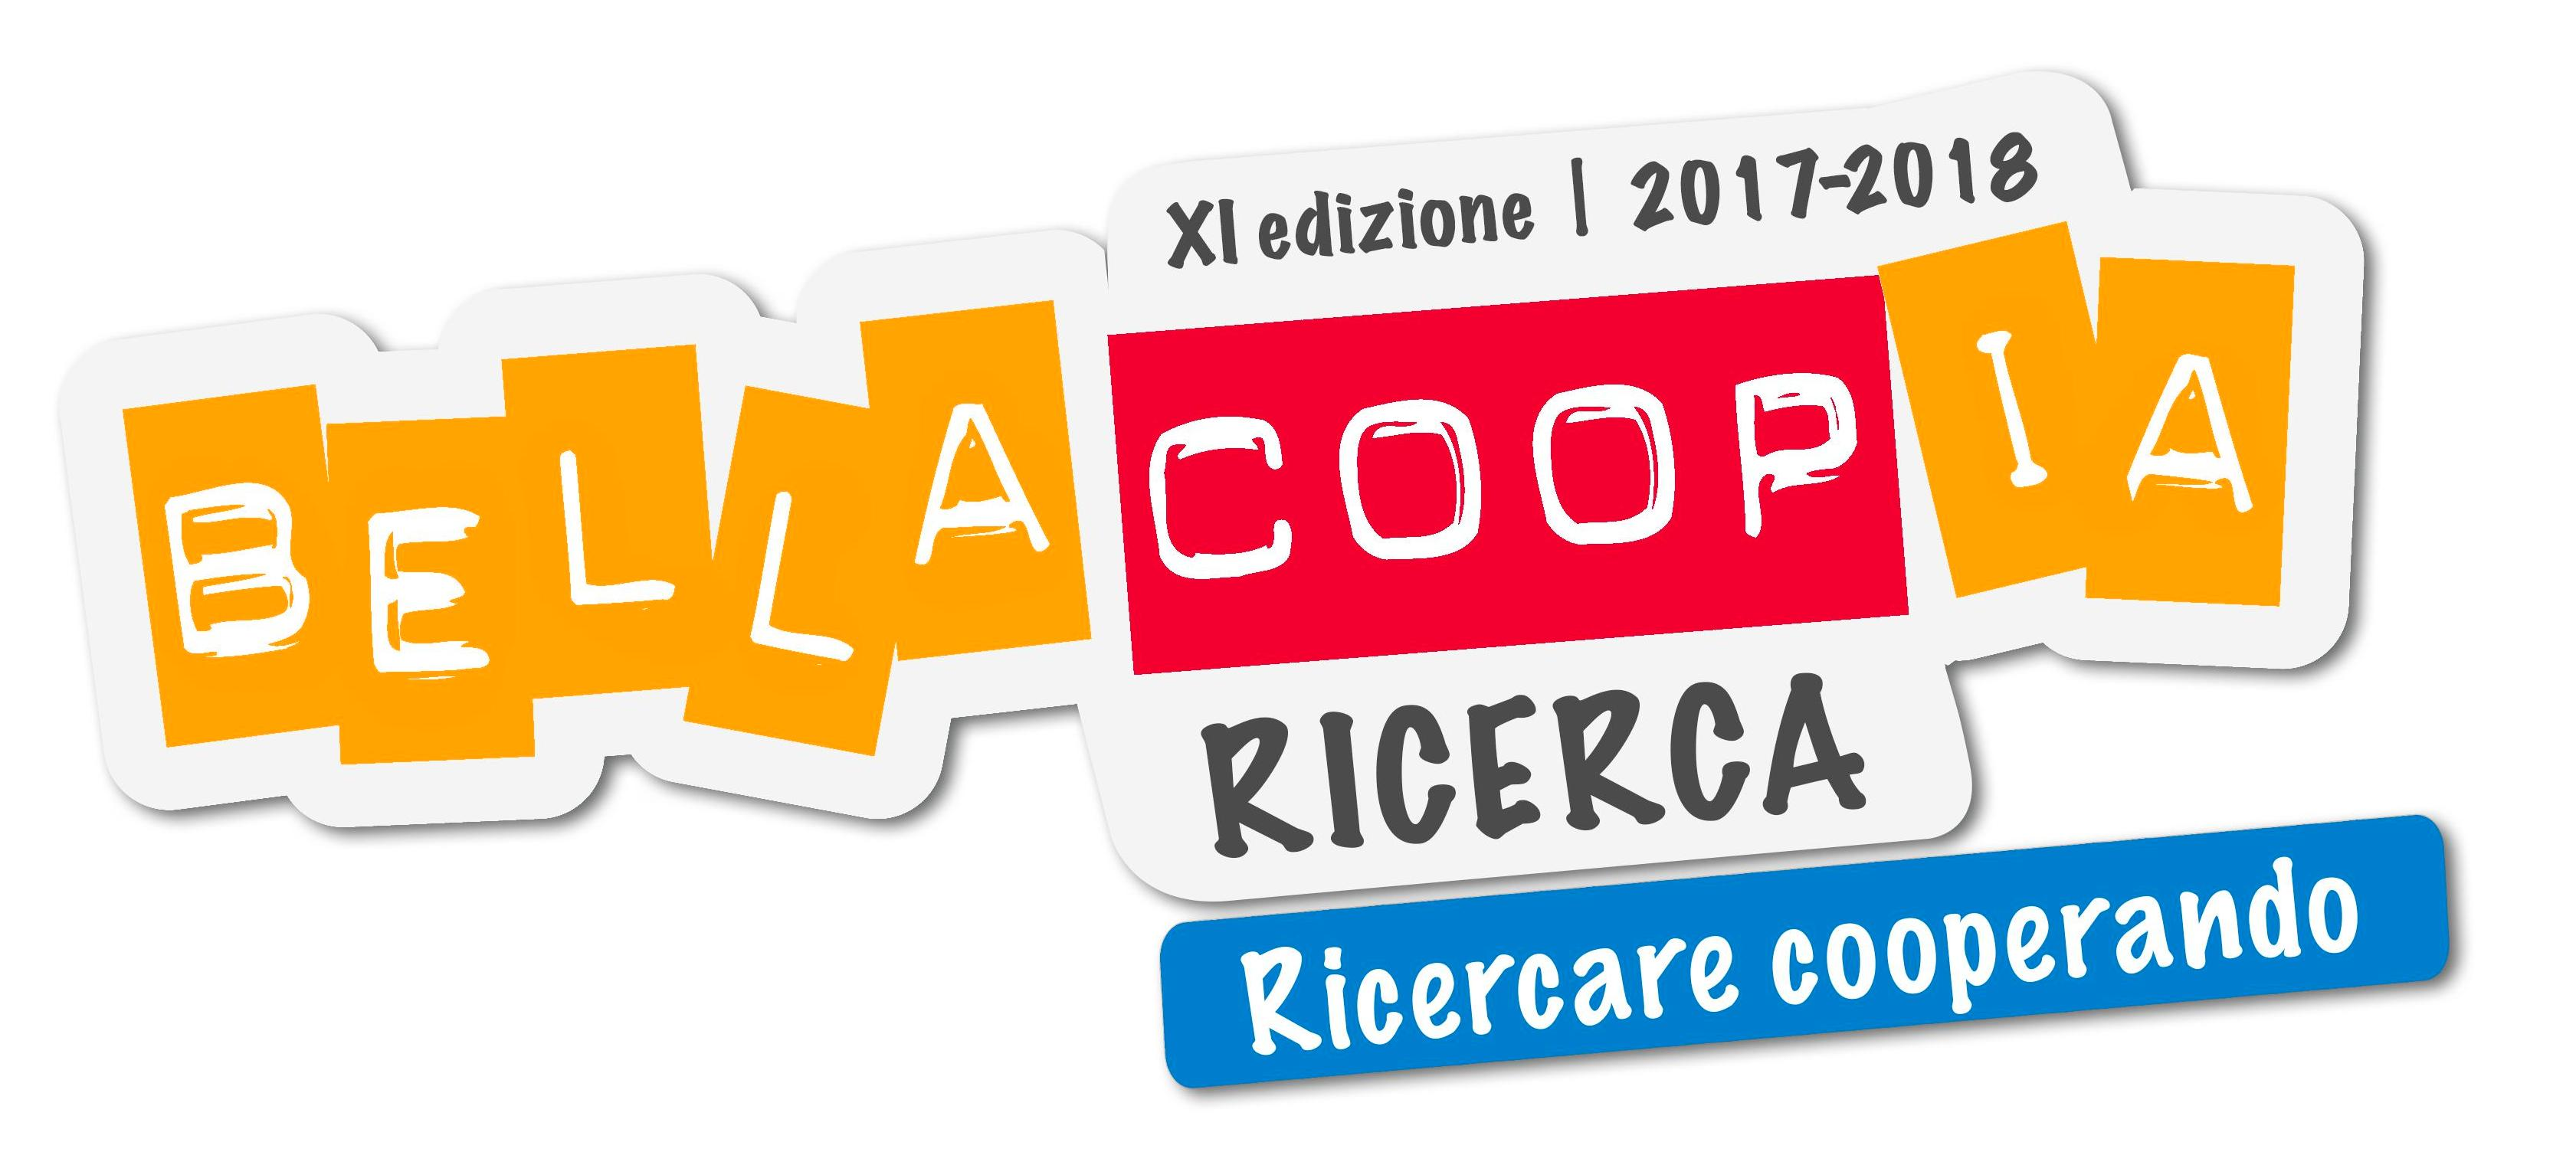 Ricerca logo 2017-2018